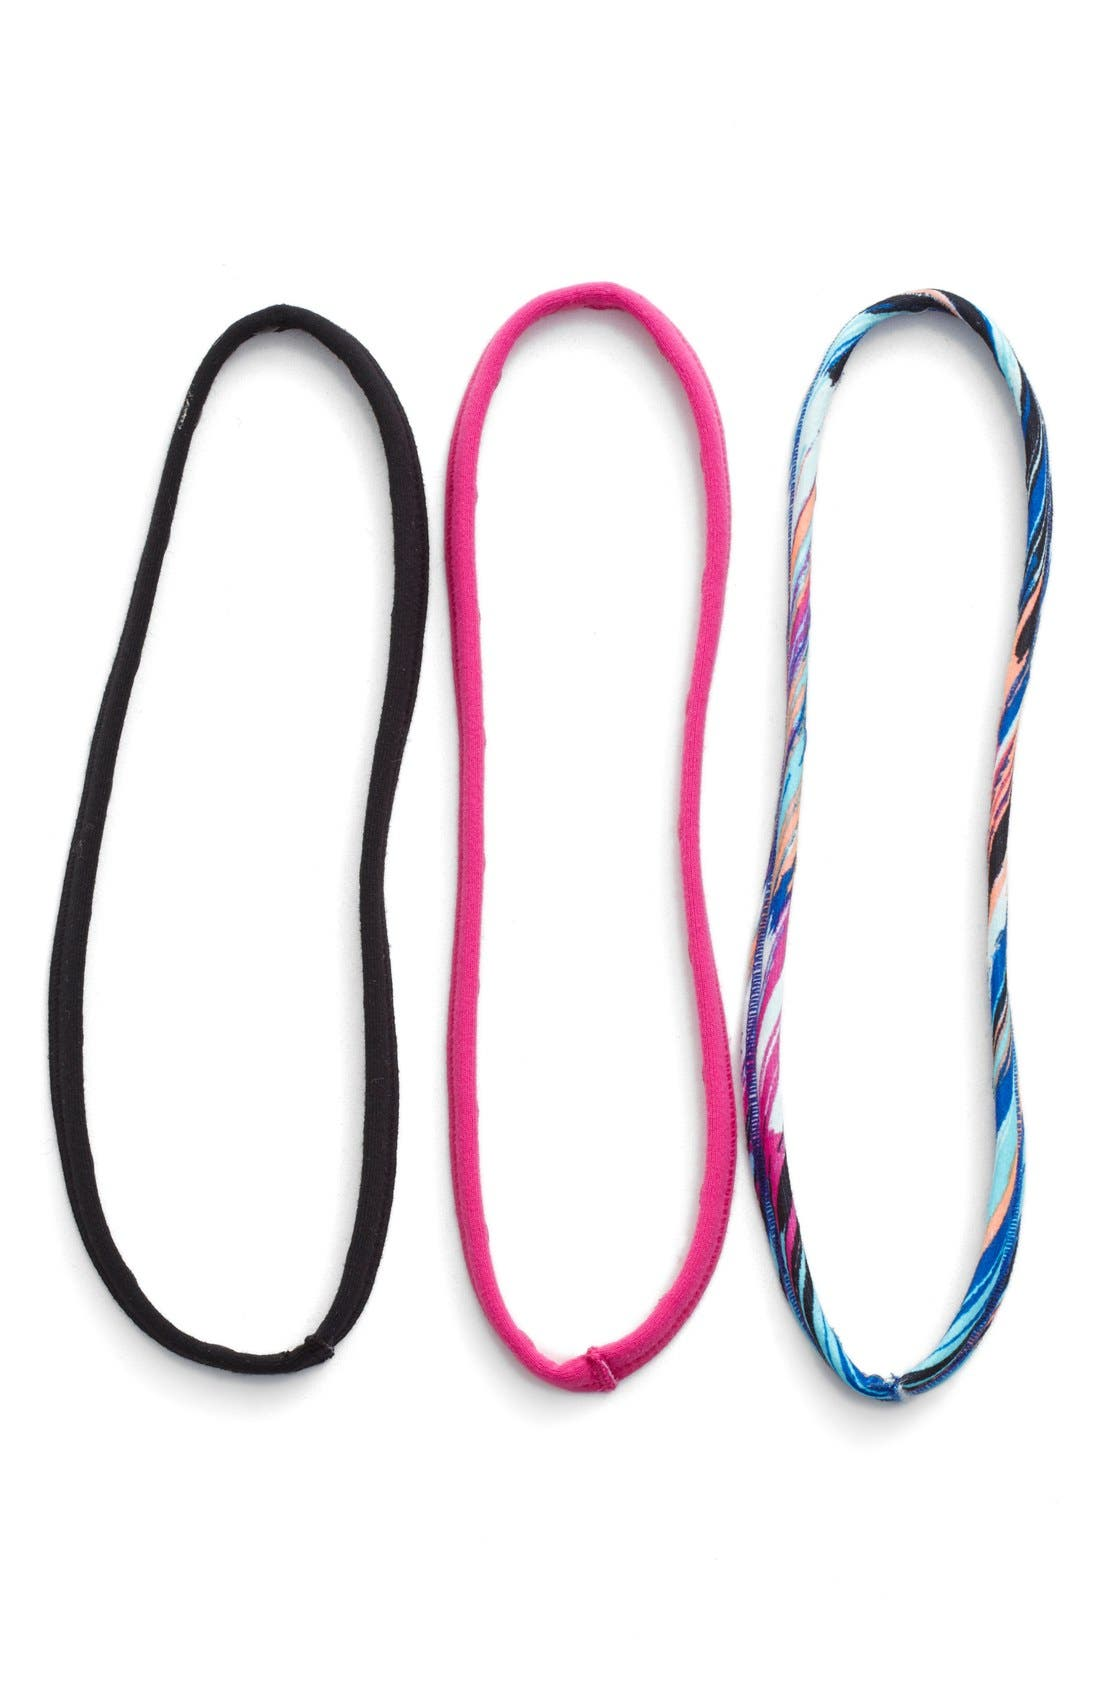 'Skinny Minnie' Headbands,                         Main,                         color, Pink Cyclamen